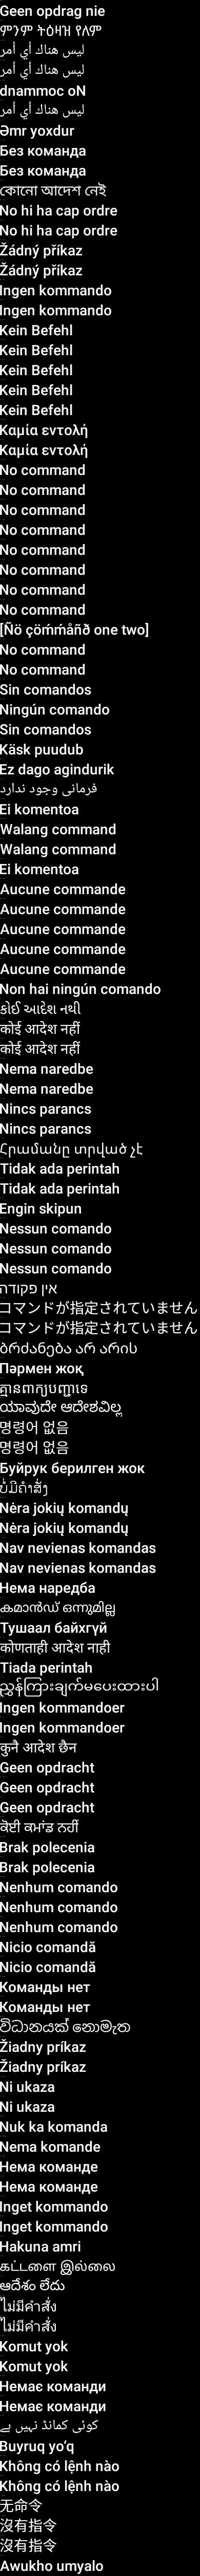 res-xhdpi/images/no_command_text.png